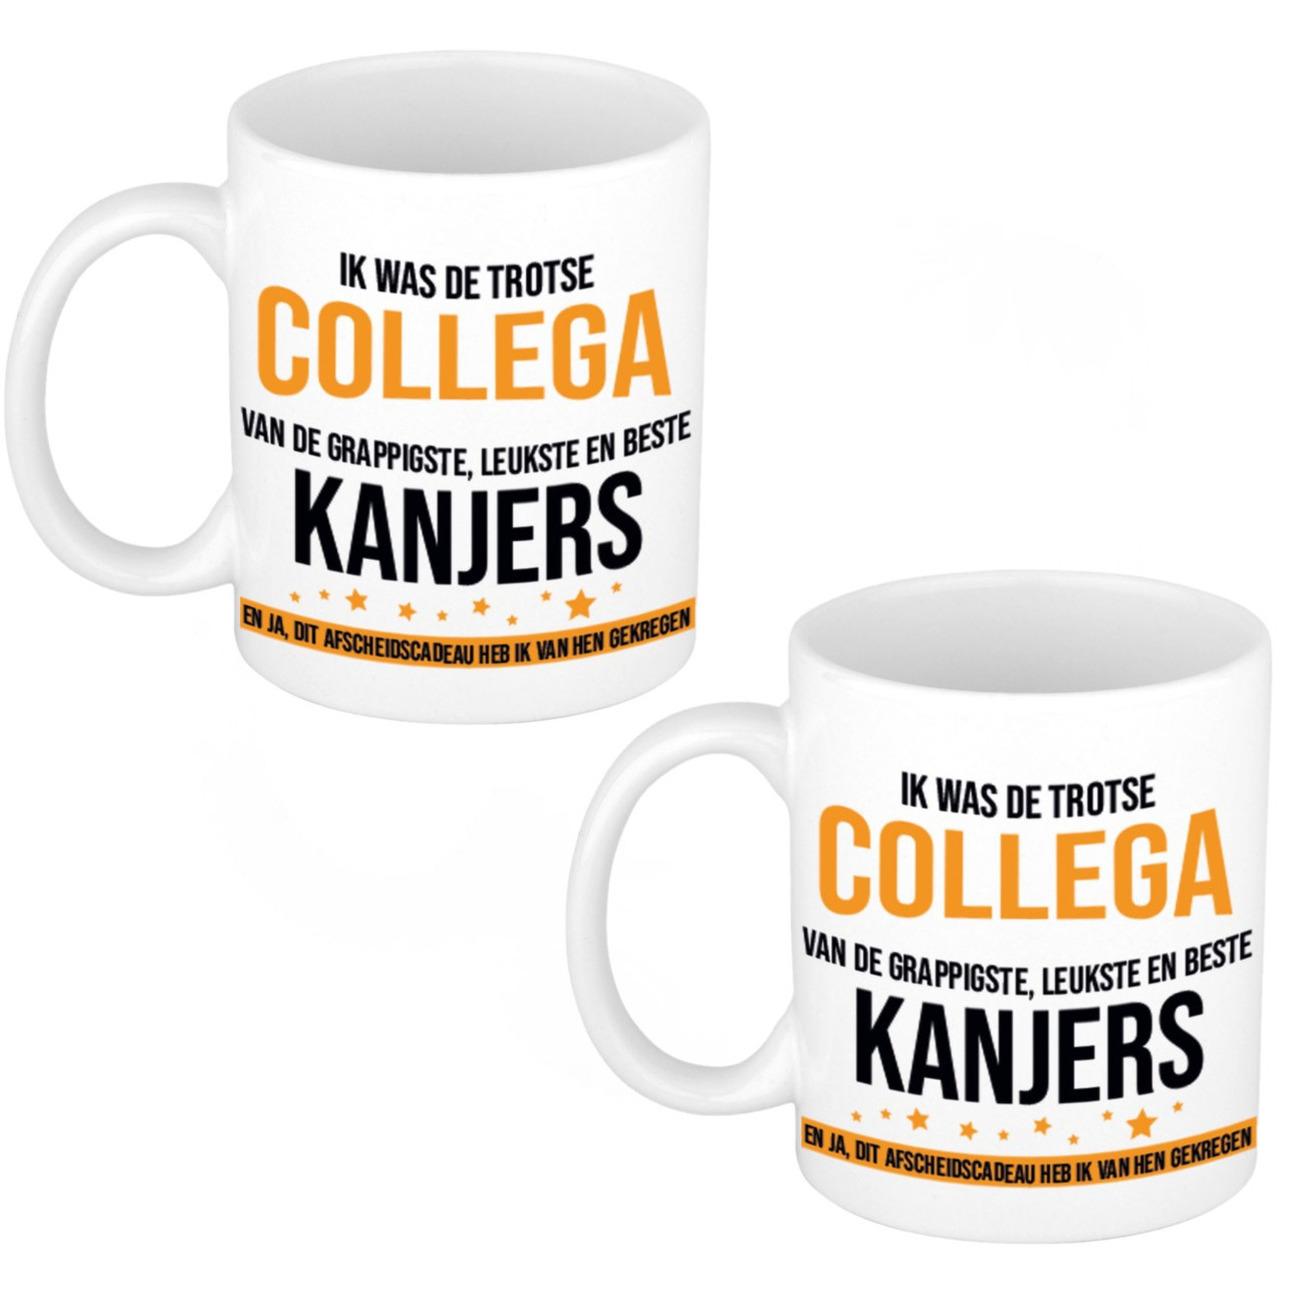 10x stuks trotse collega kanjers afscheidscadeau koffiemok / theebeker 300 ml -